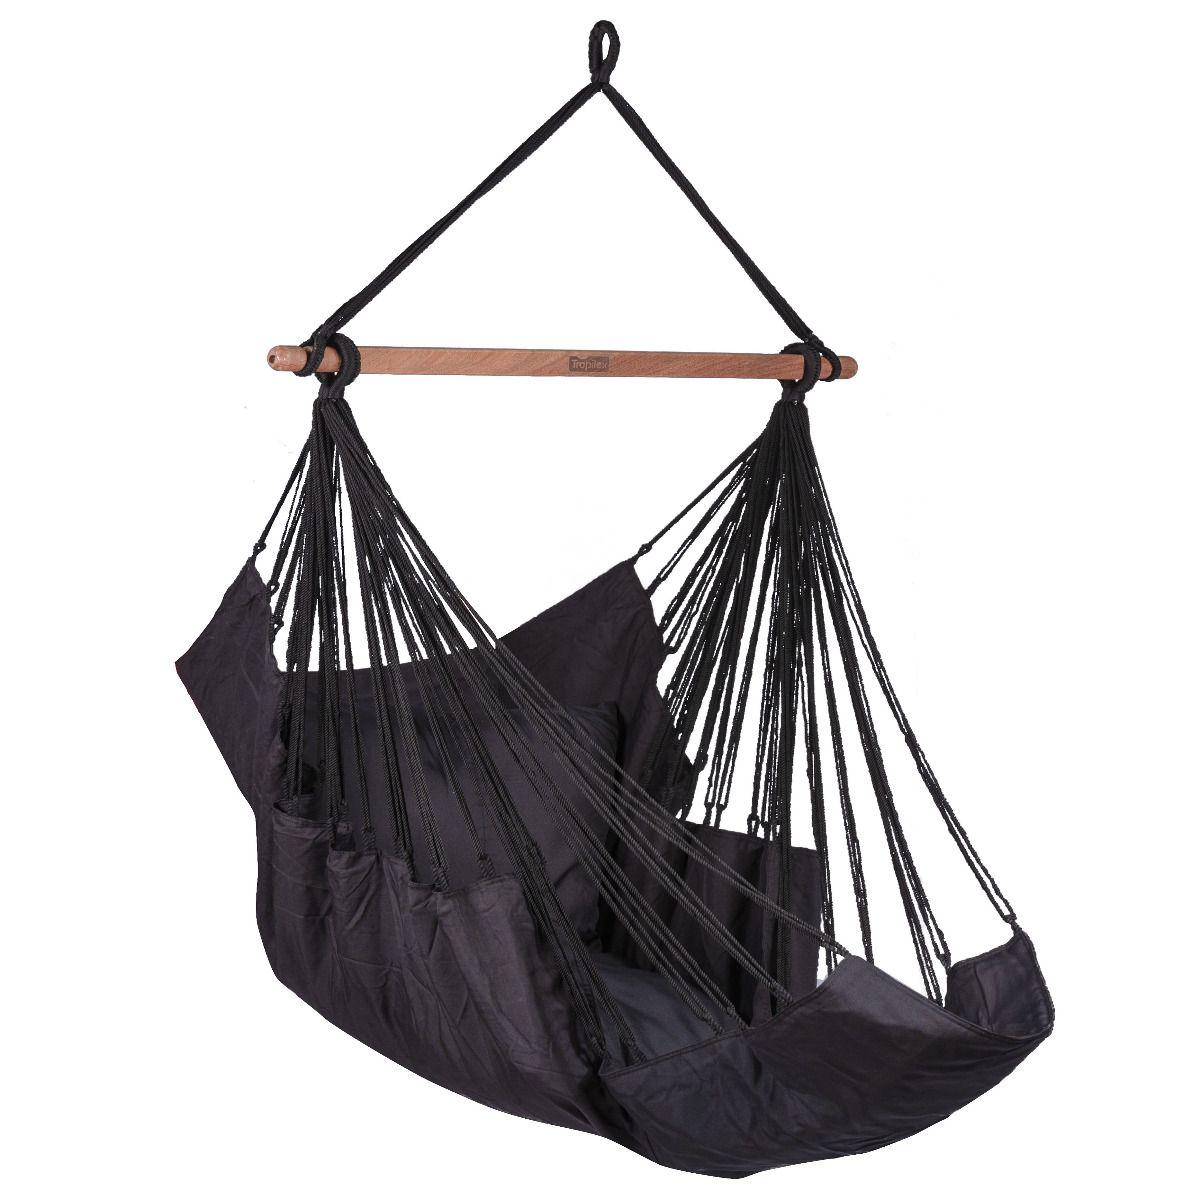 Hammock Chair Sereno Black Tropilex